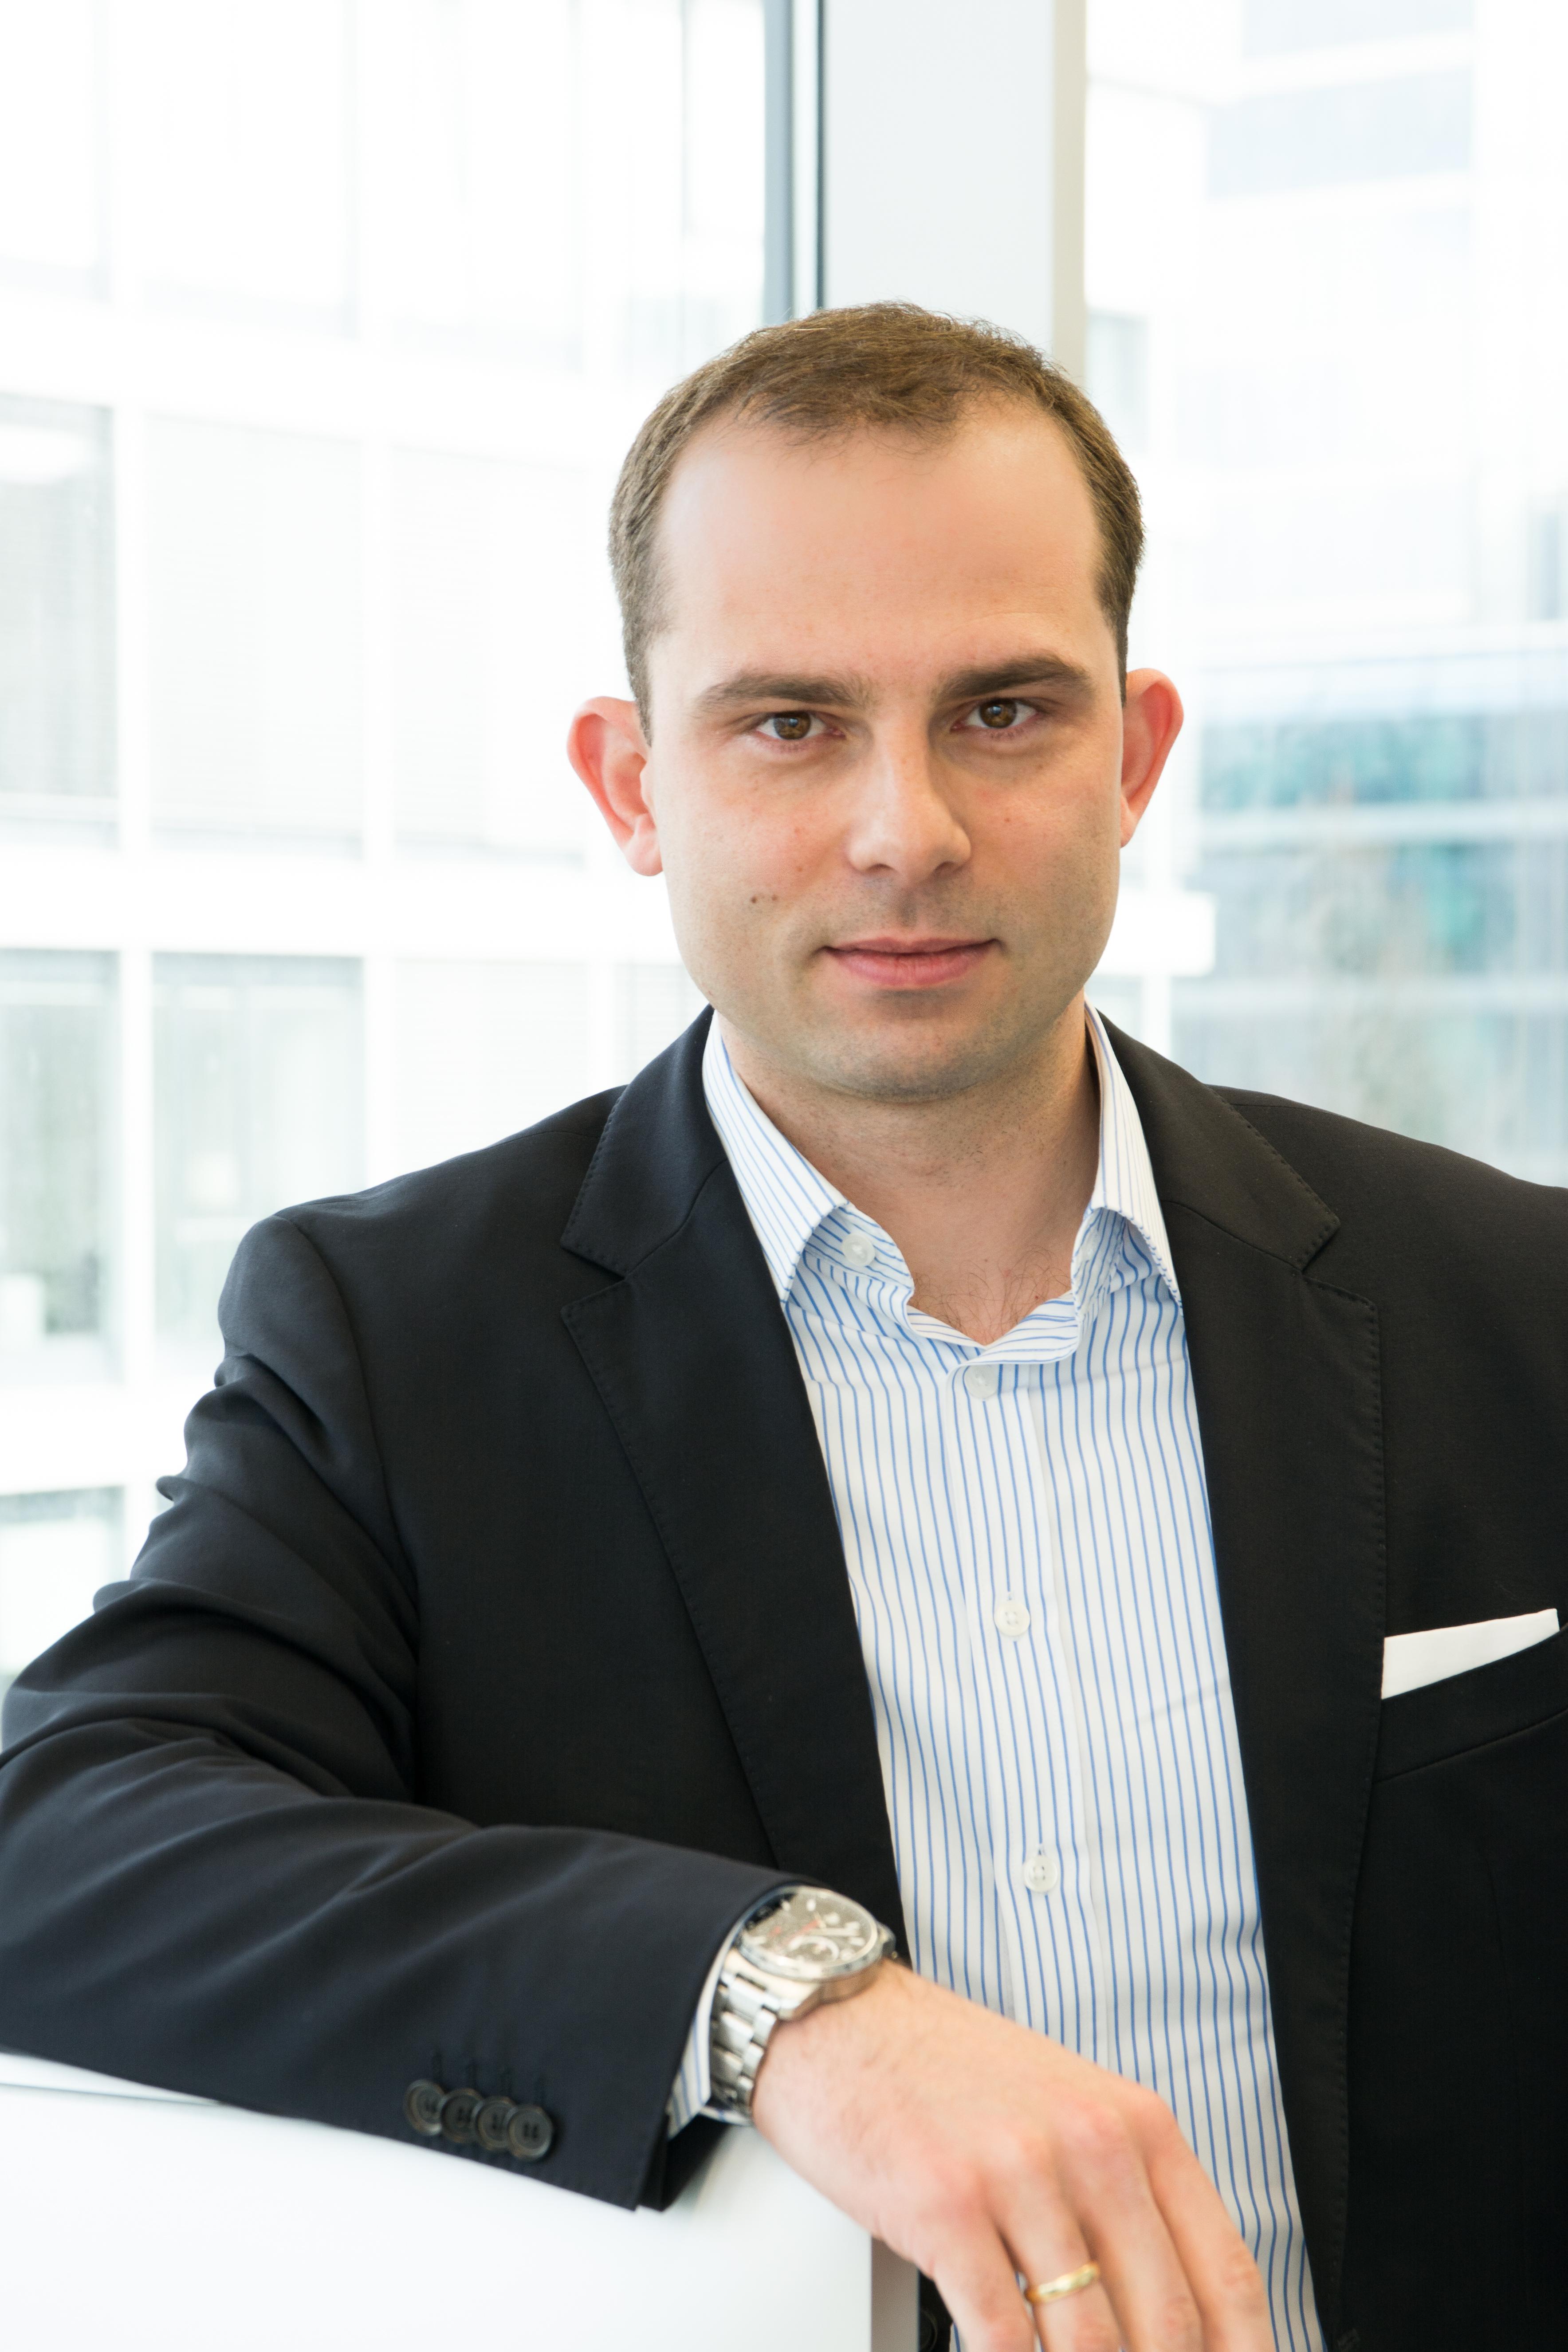 Philipp P. Spangenberg, CEO of baimos technologies